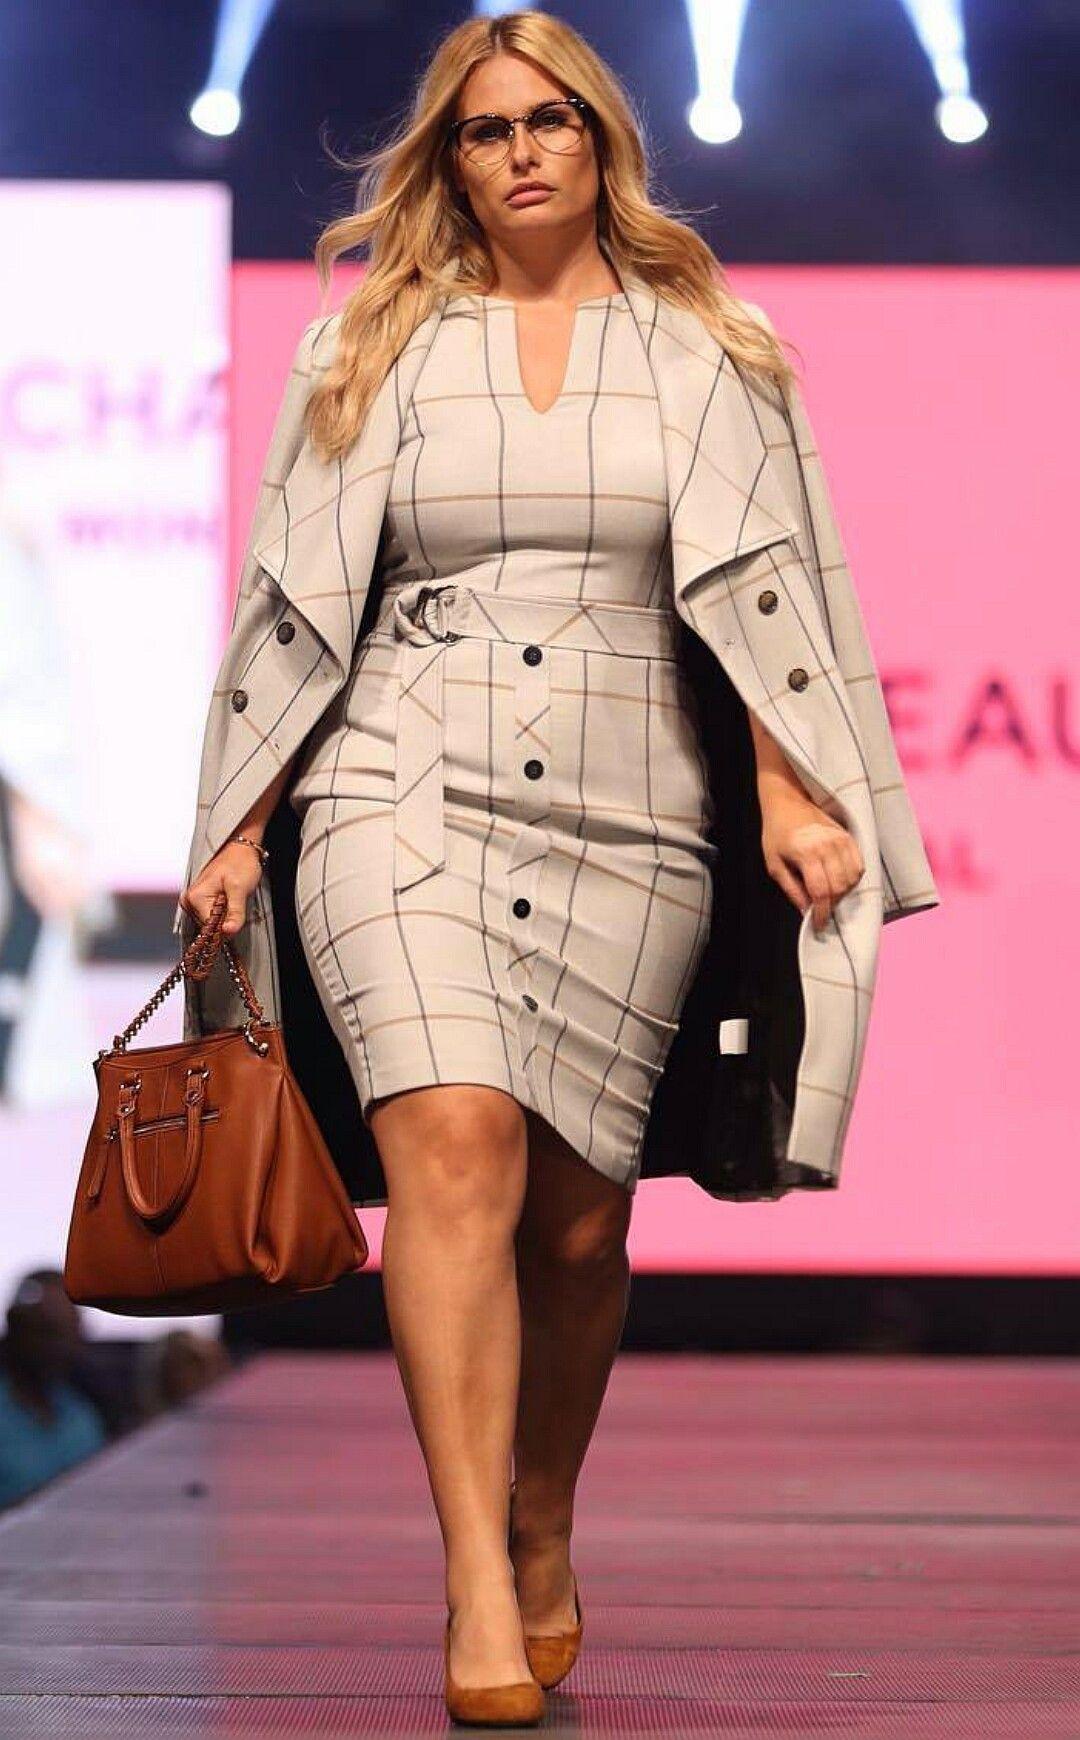 Pin by Delta Wun on Fashion ideas | Pinterest | Real women, Curvy ...